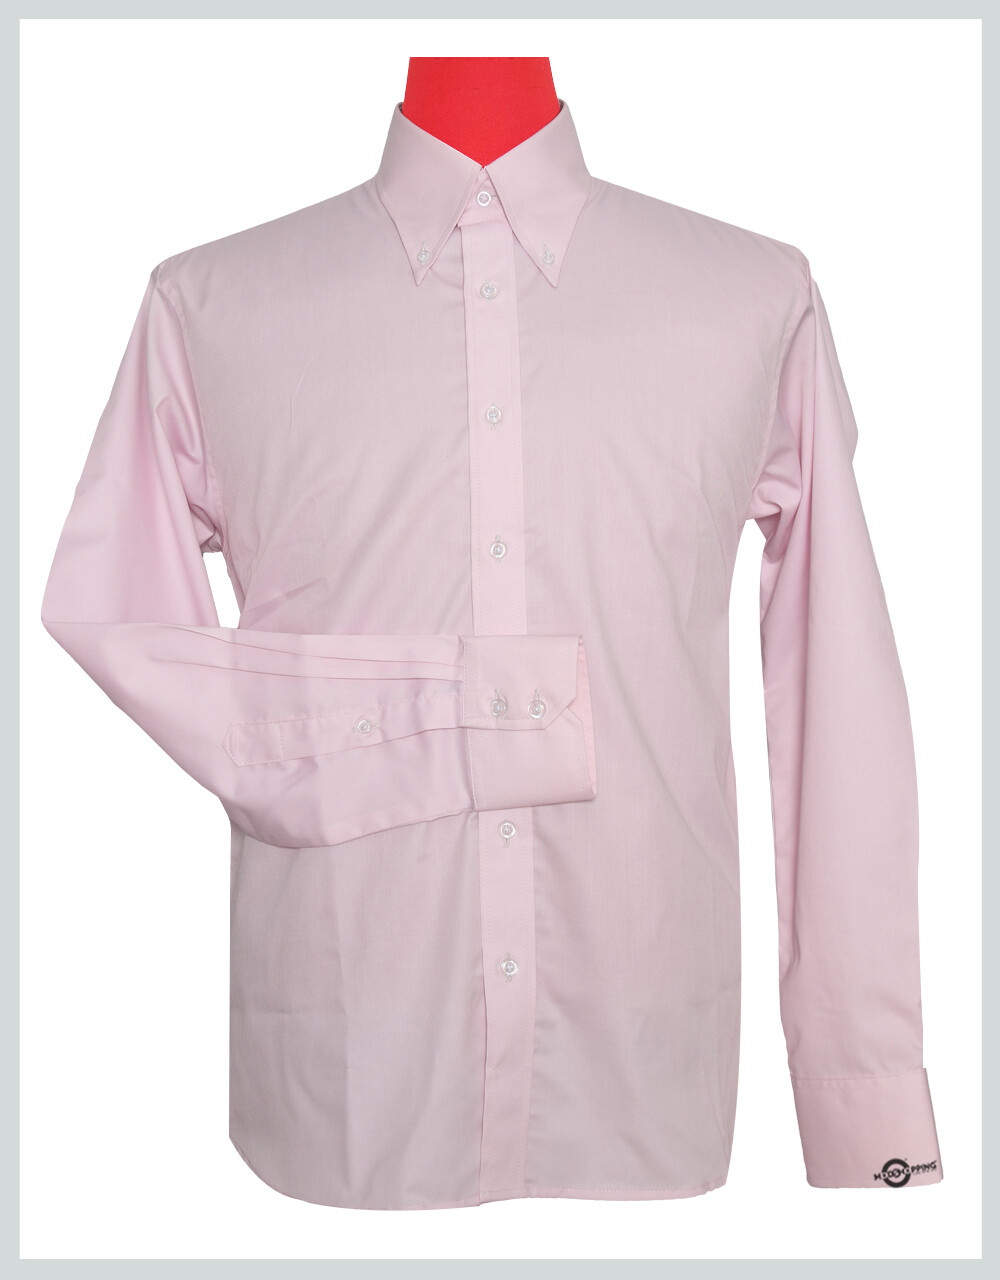 Button-Down Collar Shirt | Light Pink Color Shirt